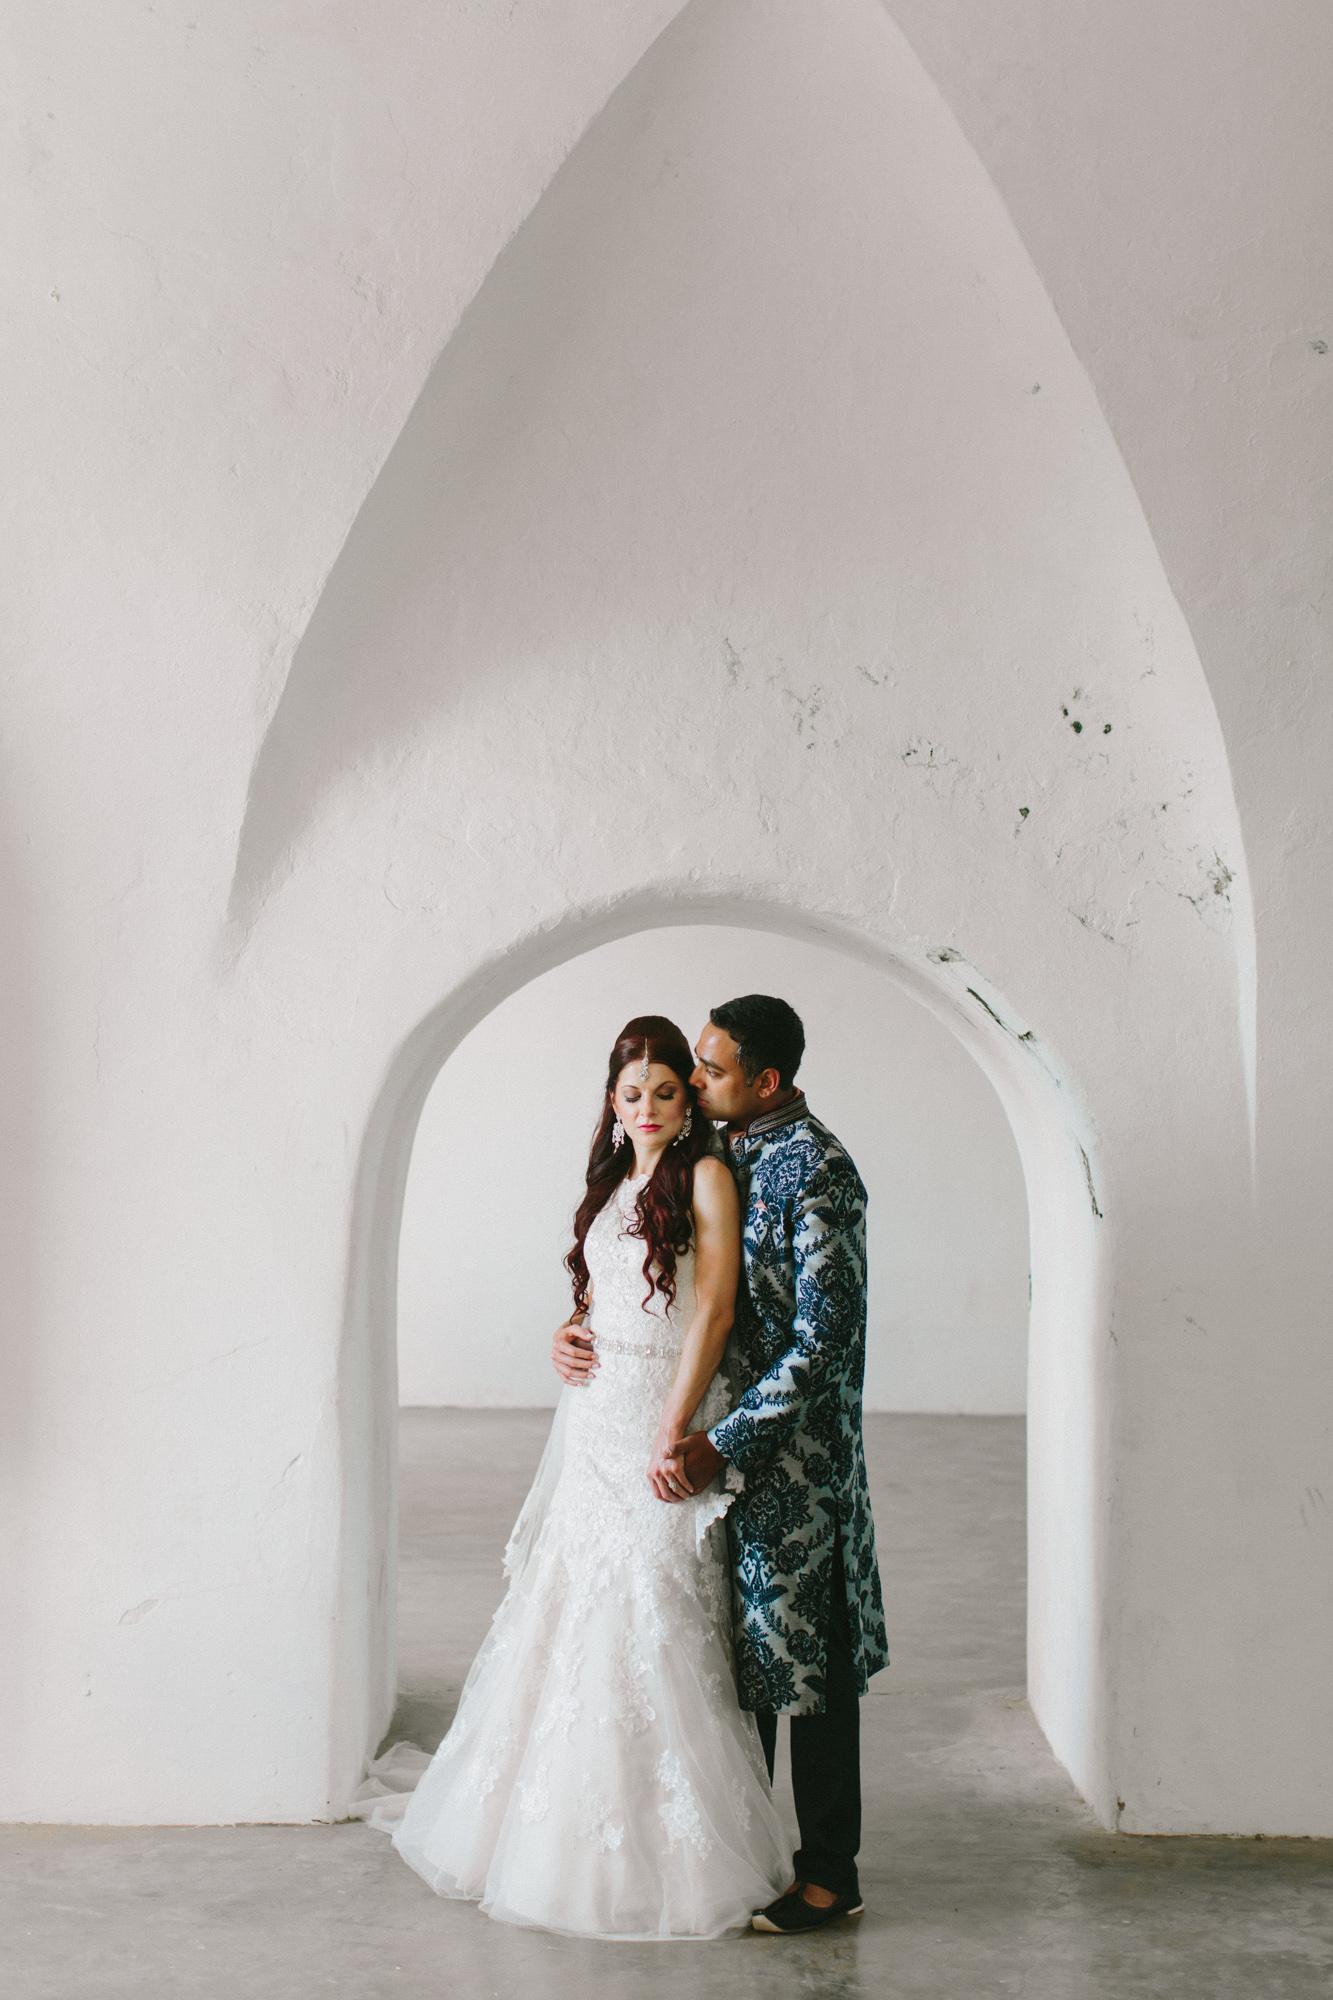 Puerto Rico Wedding Photography Destination Photographer Boris Zaretsky San Juan PR Casino Antiguo La Concha _B2C6509.jpg